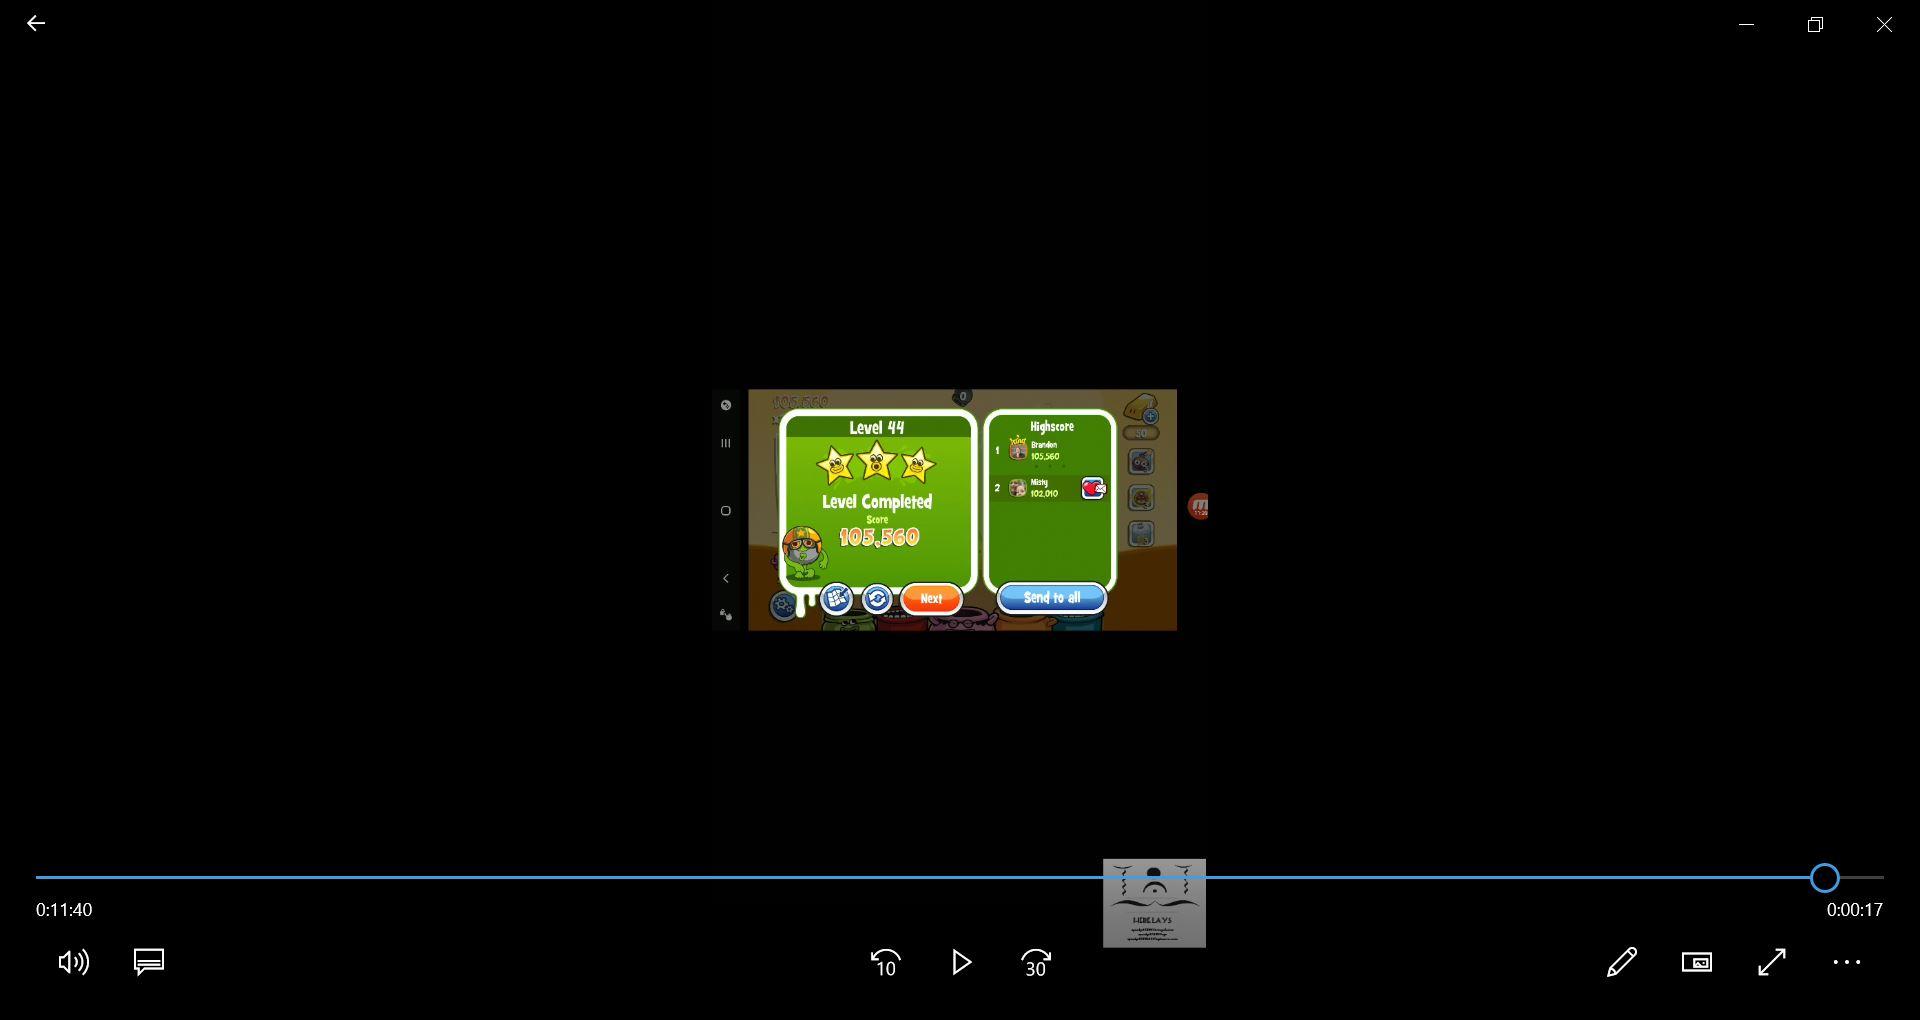 speedy4759123: Papa Pear Saga: Level 044 (Android) 105,560 points on 2020-03-26 08:17:25